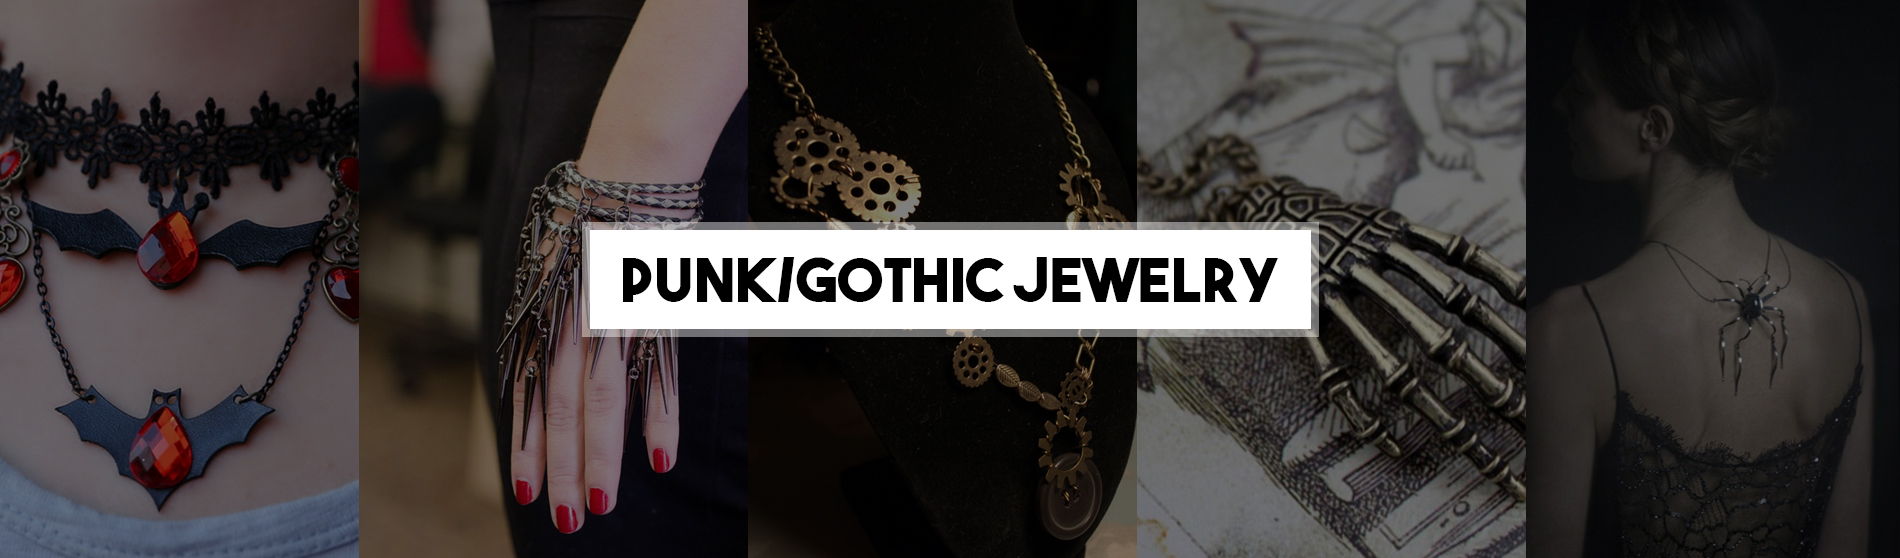 Punk-Gothic-Jewelry